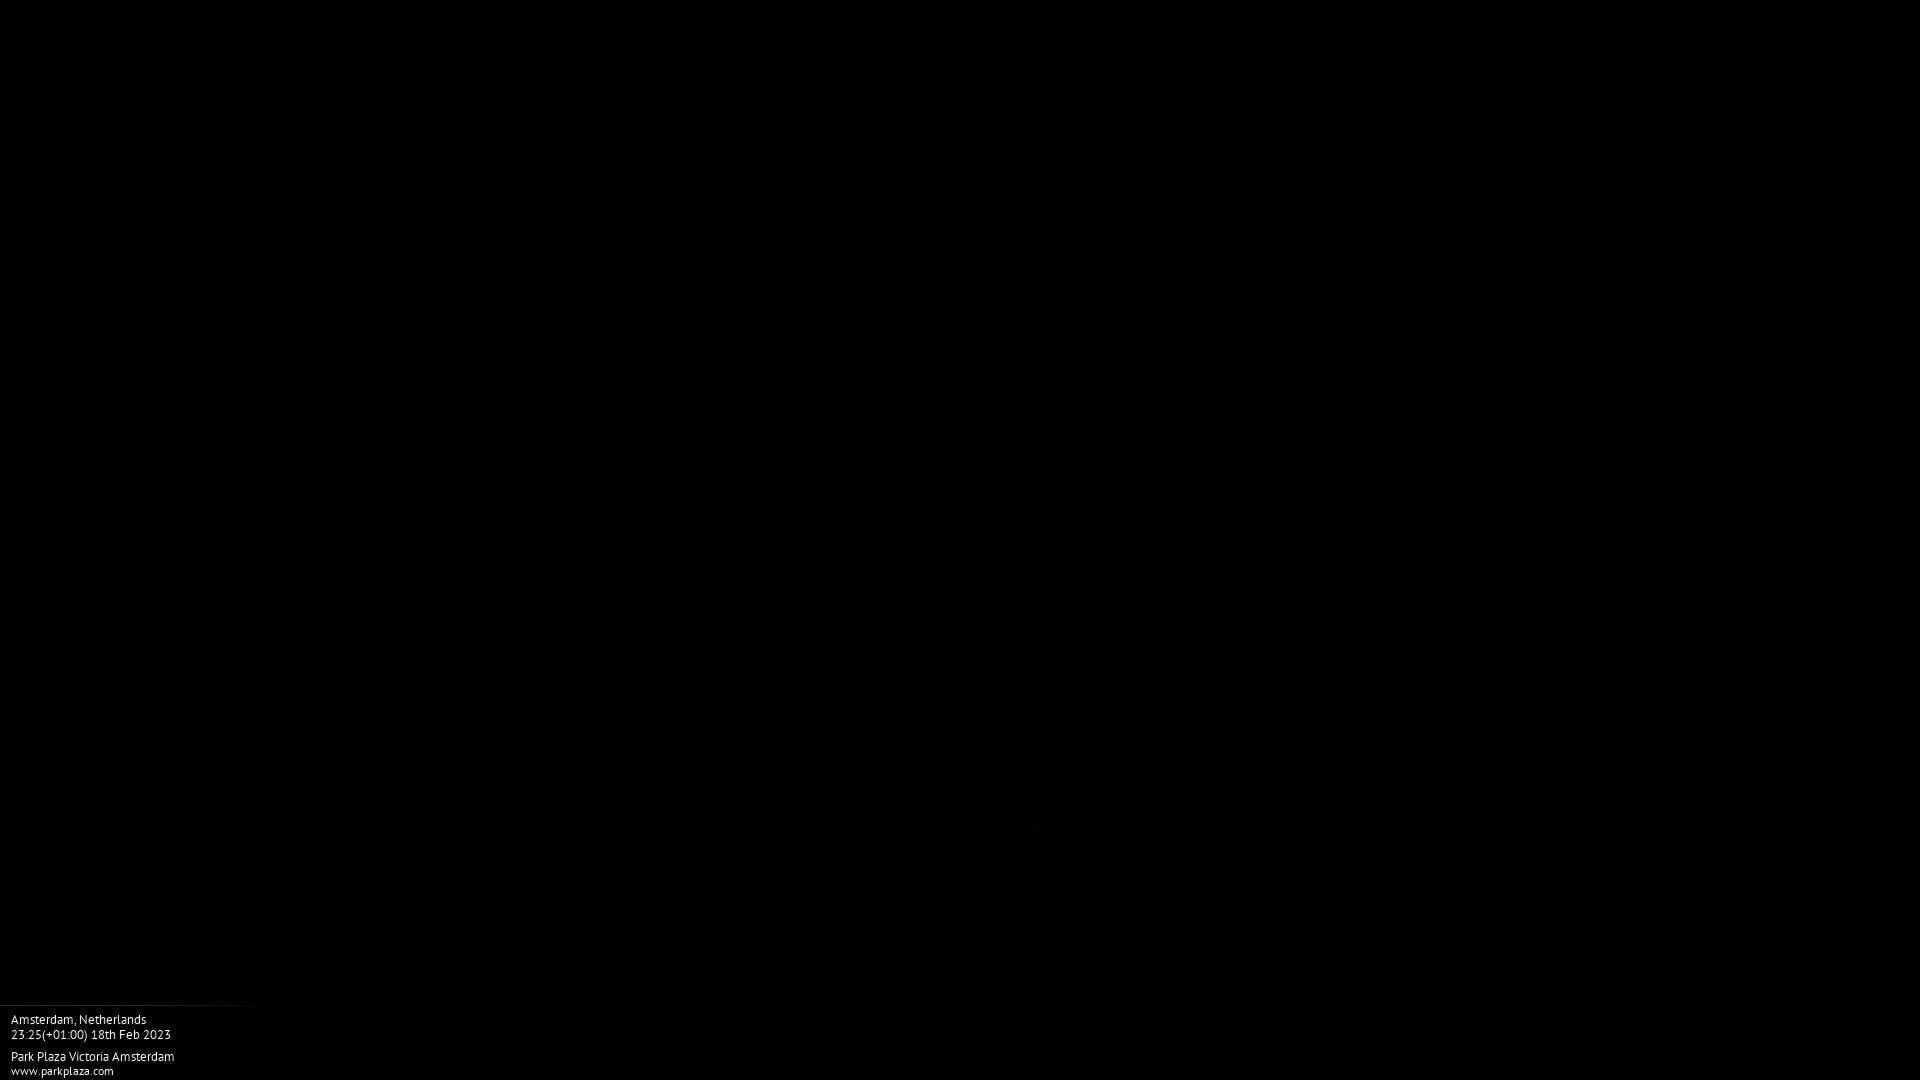 Webkamera Amsterdam: Settentrionale − Park Plaza Victoria